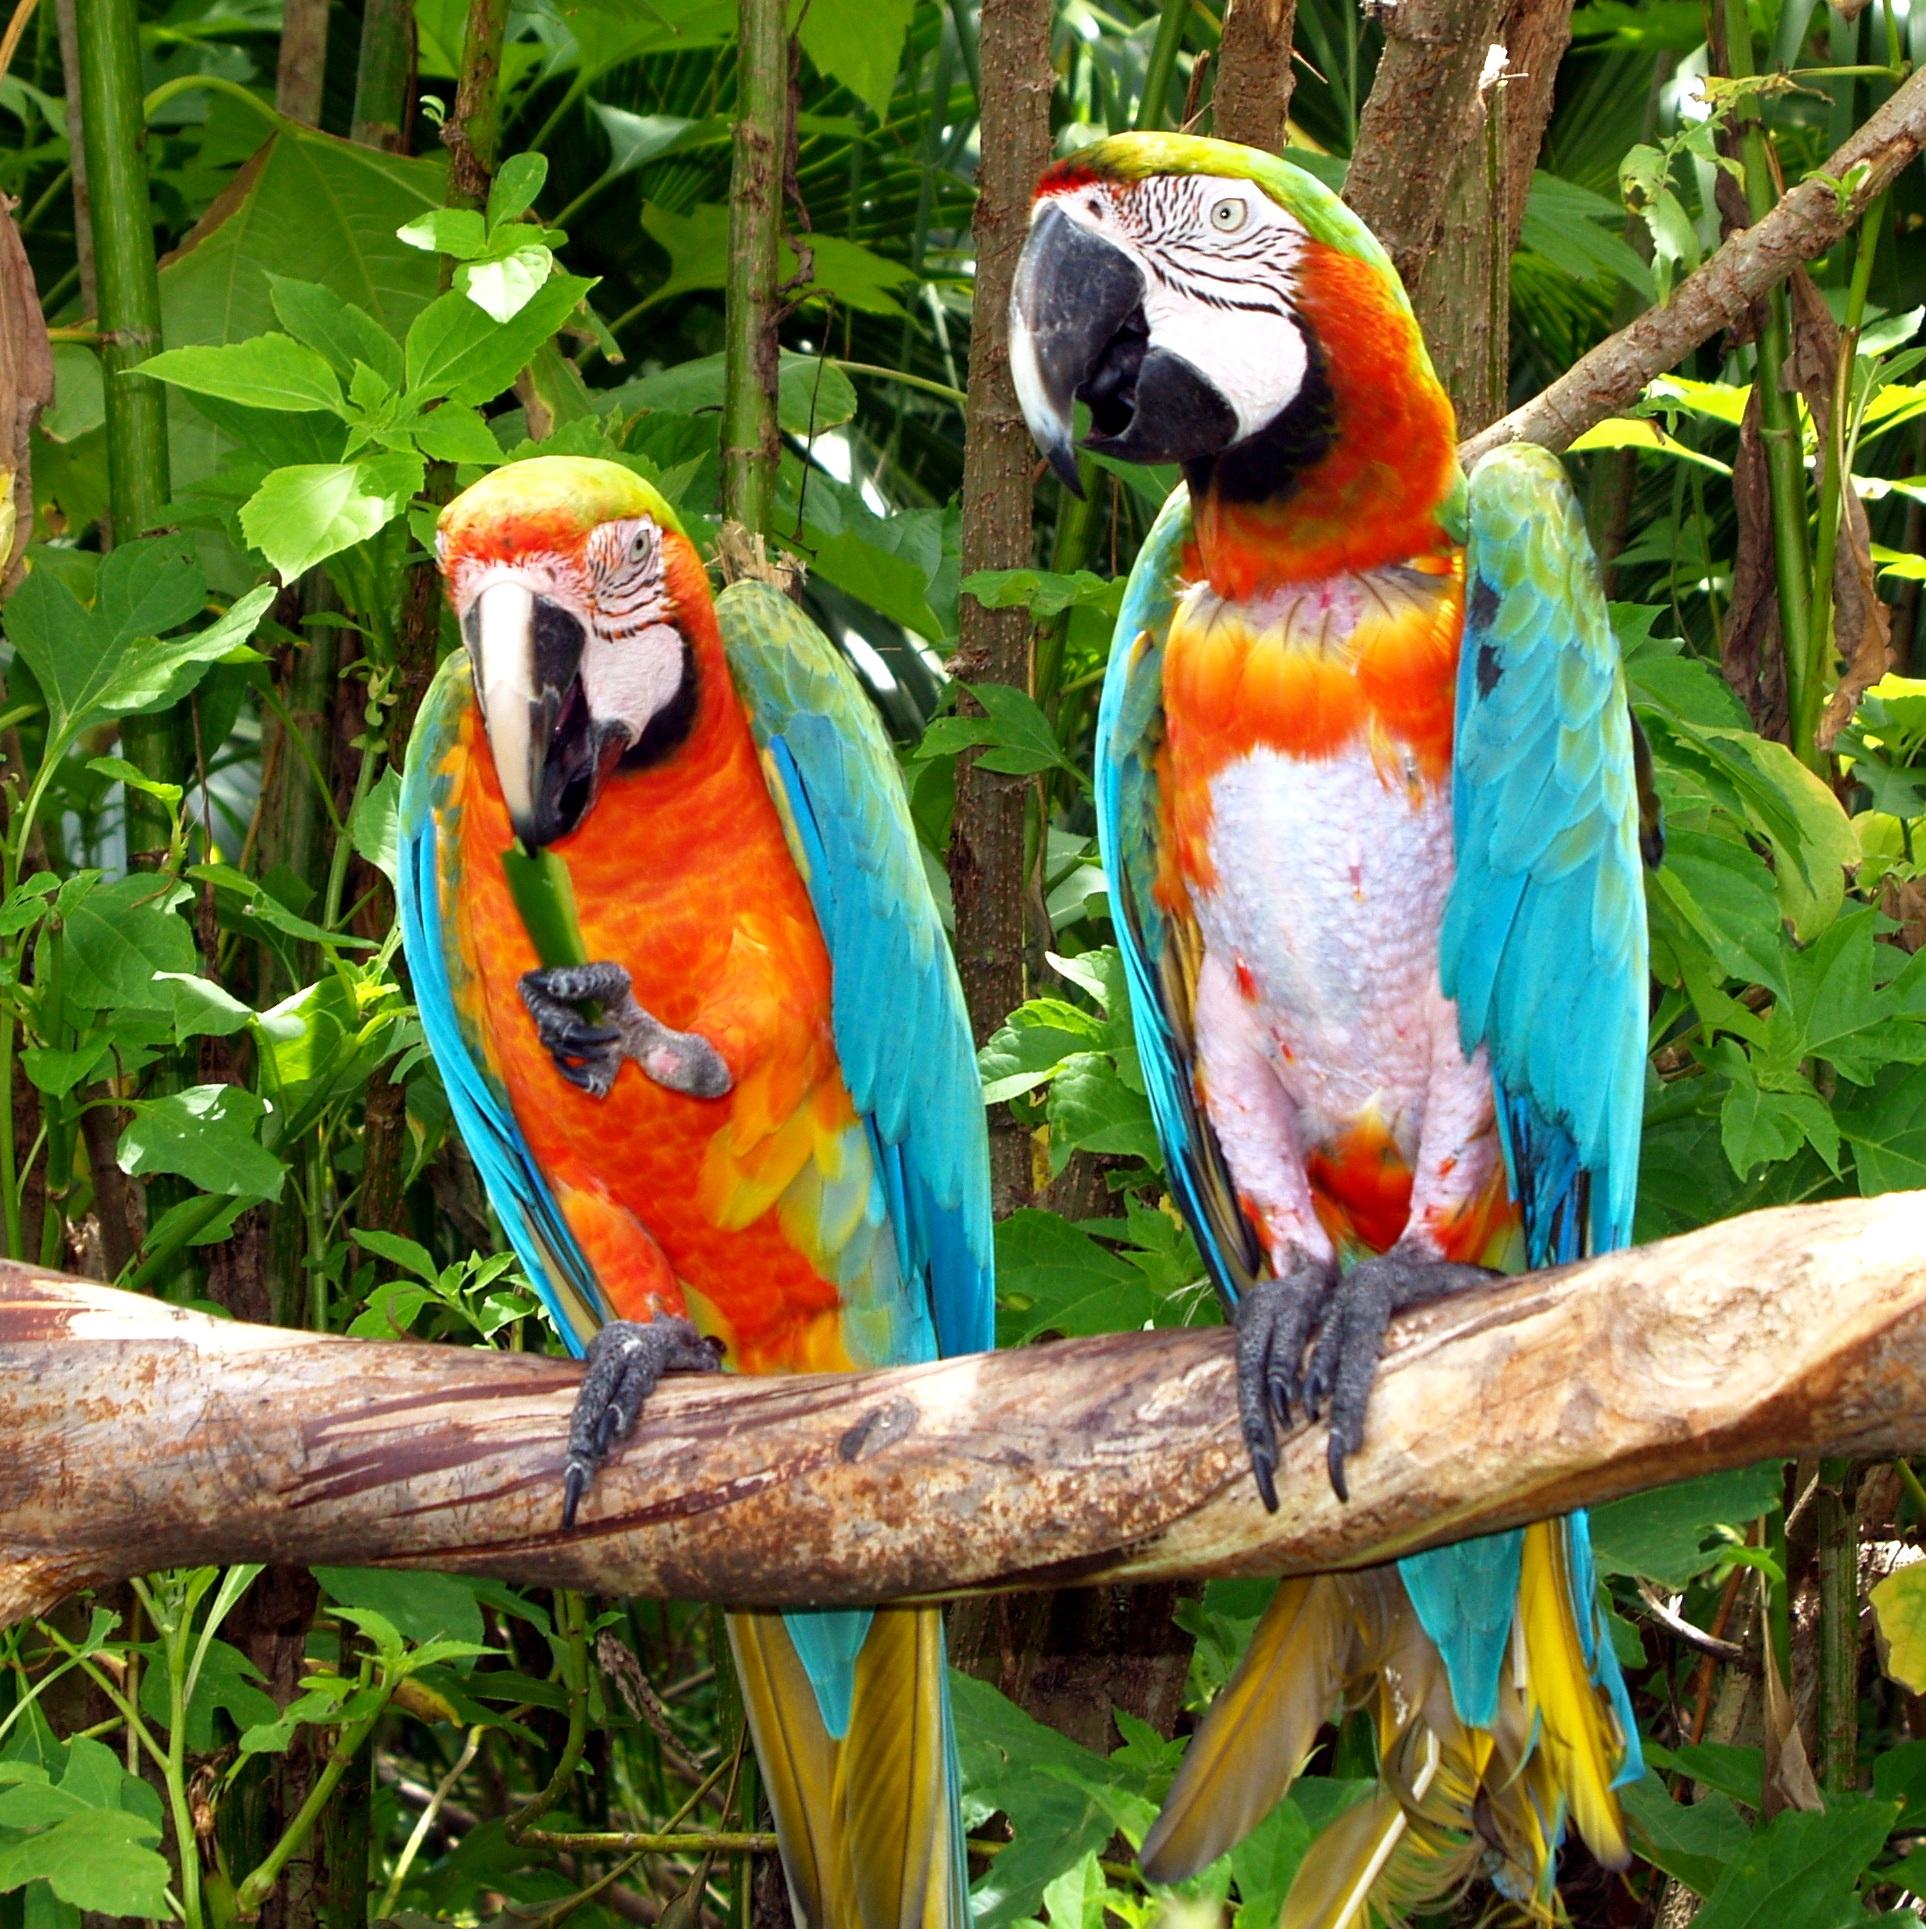 закуски картинки попугаев джунглях особенностях посадки ухода